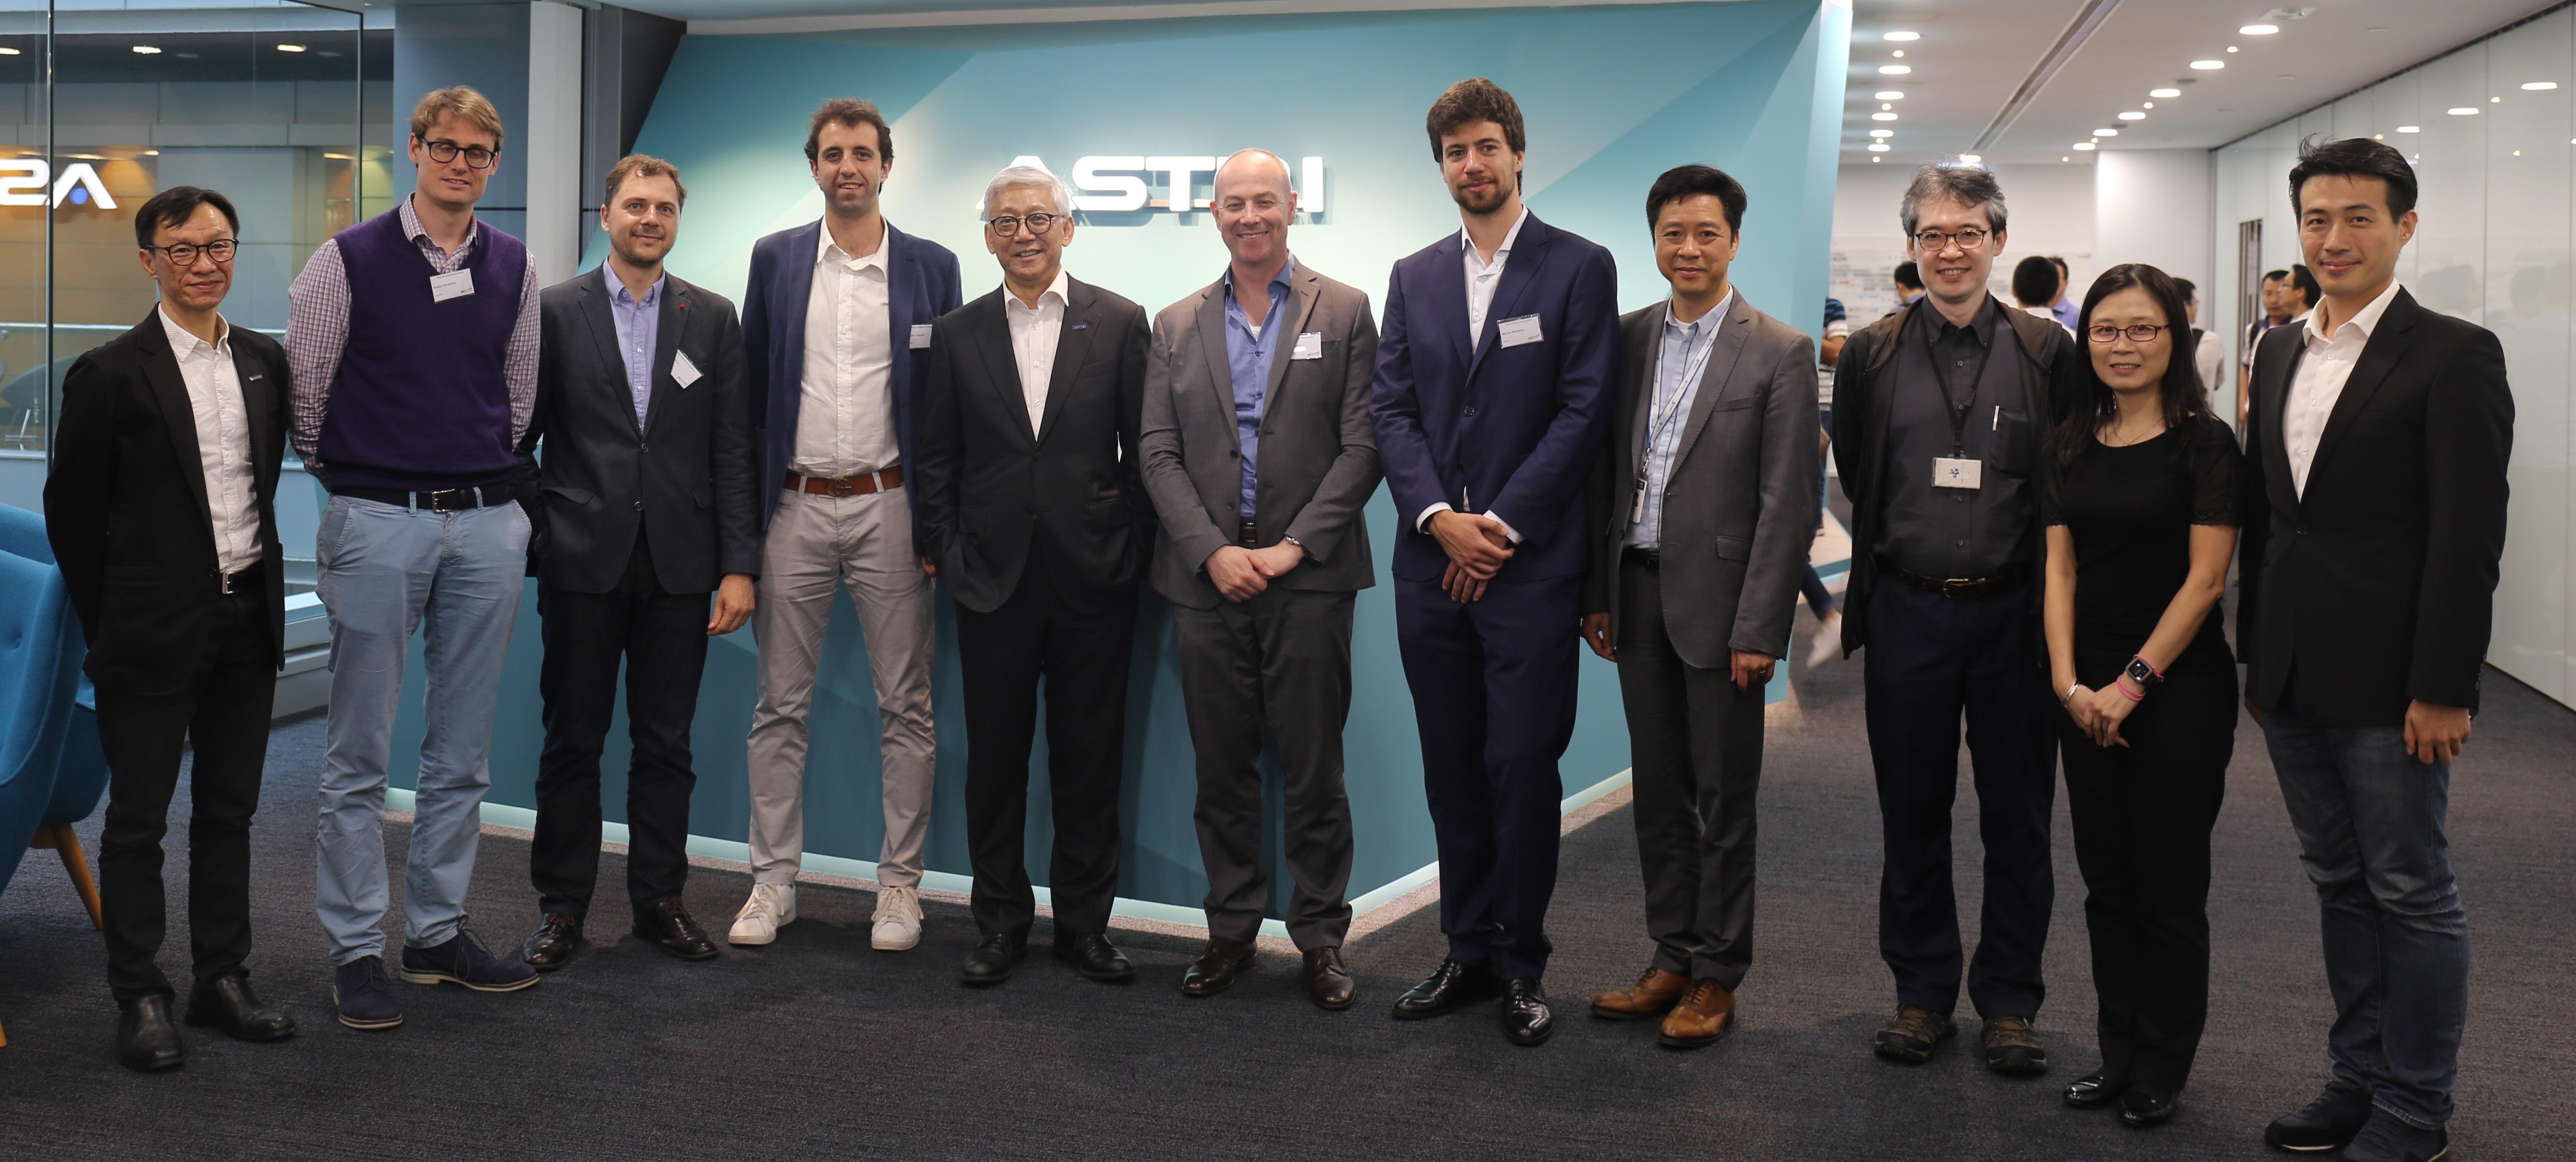 Technopark Zurich基金会代表团到访应科院